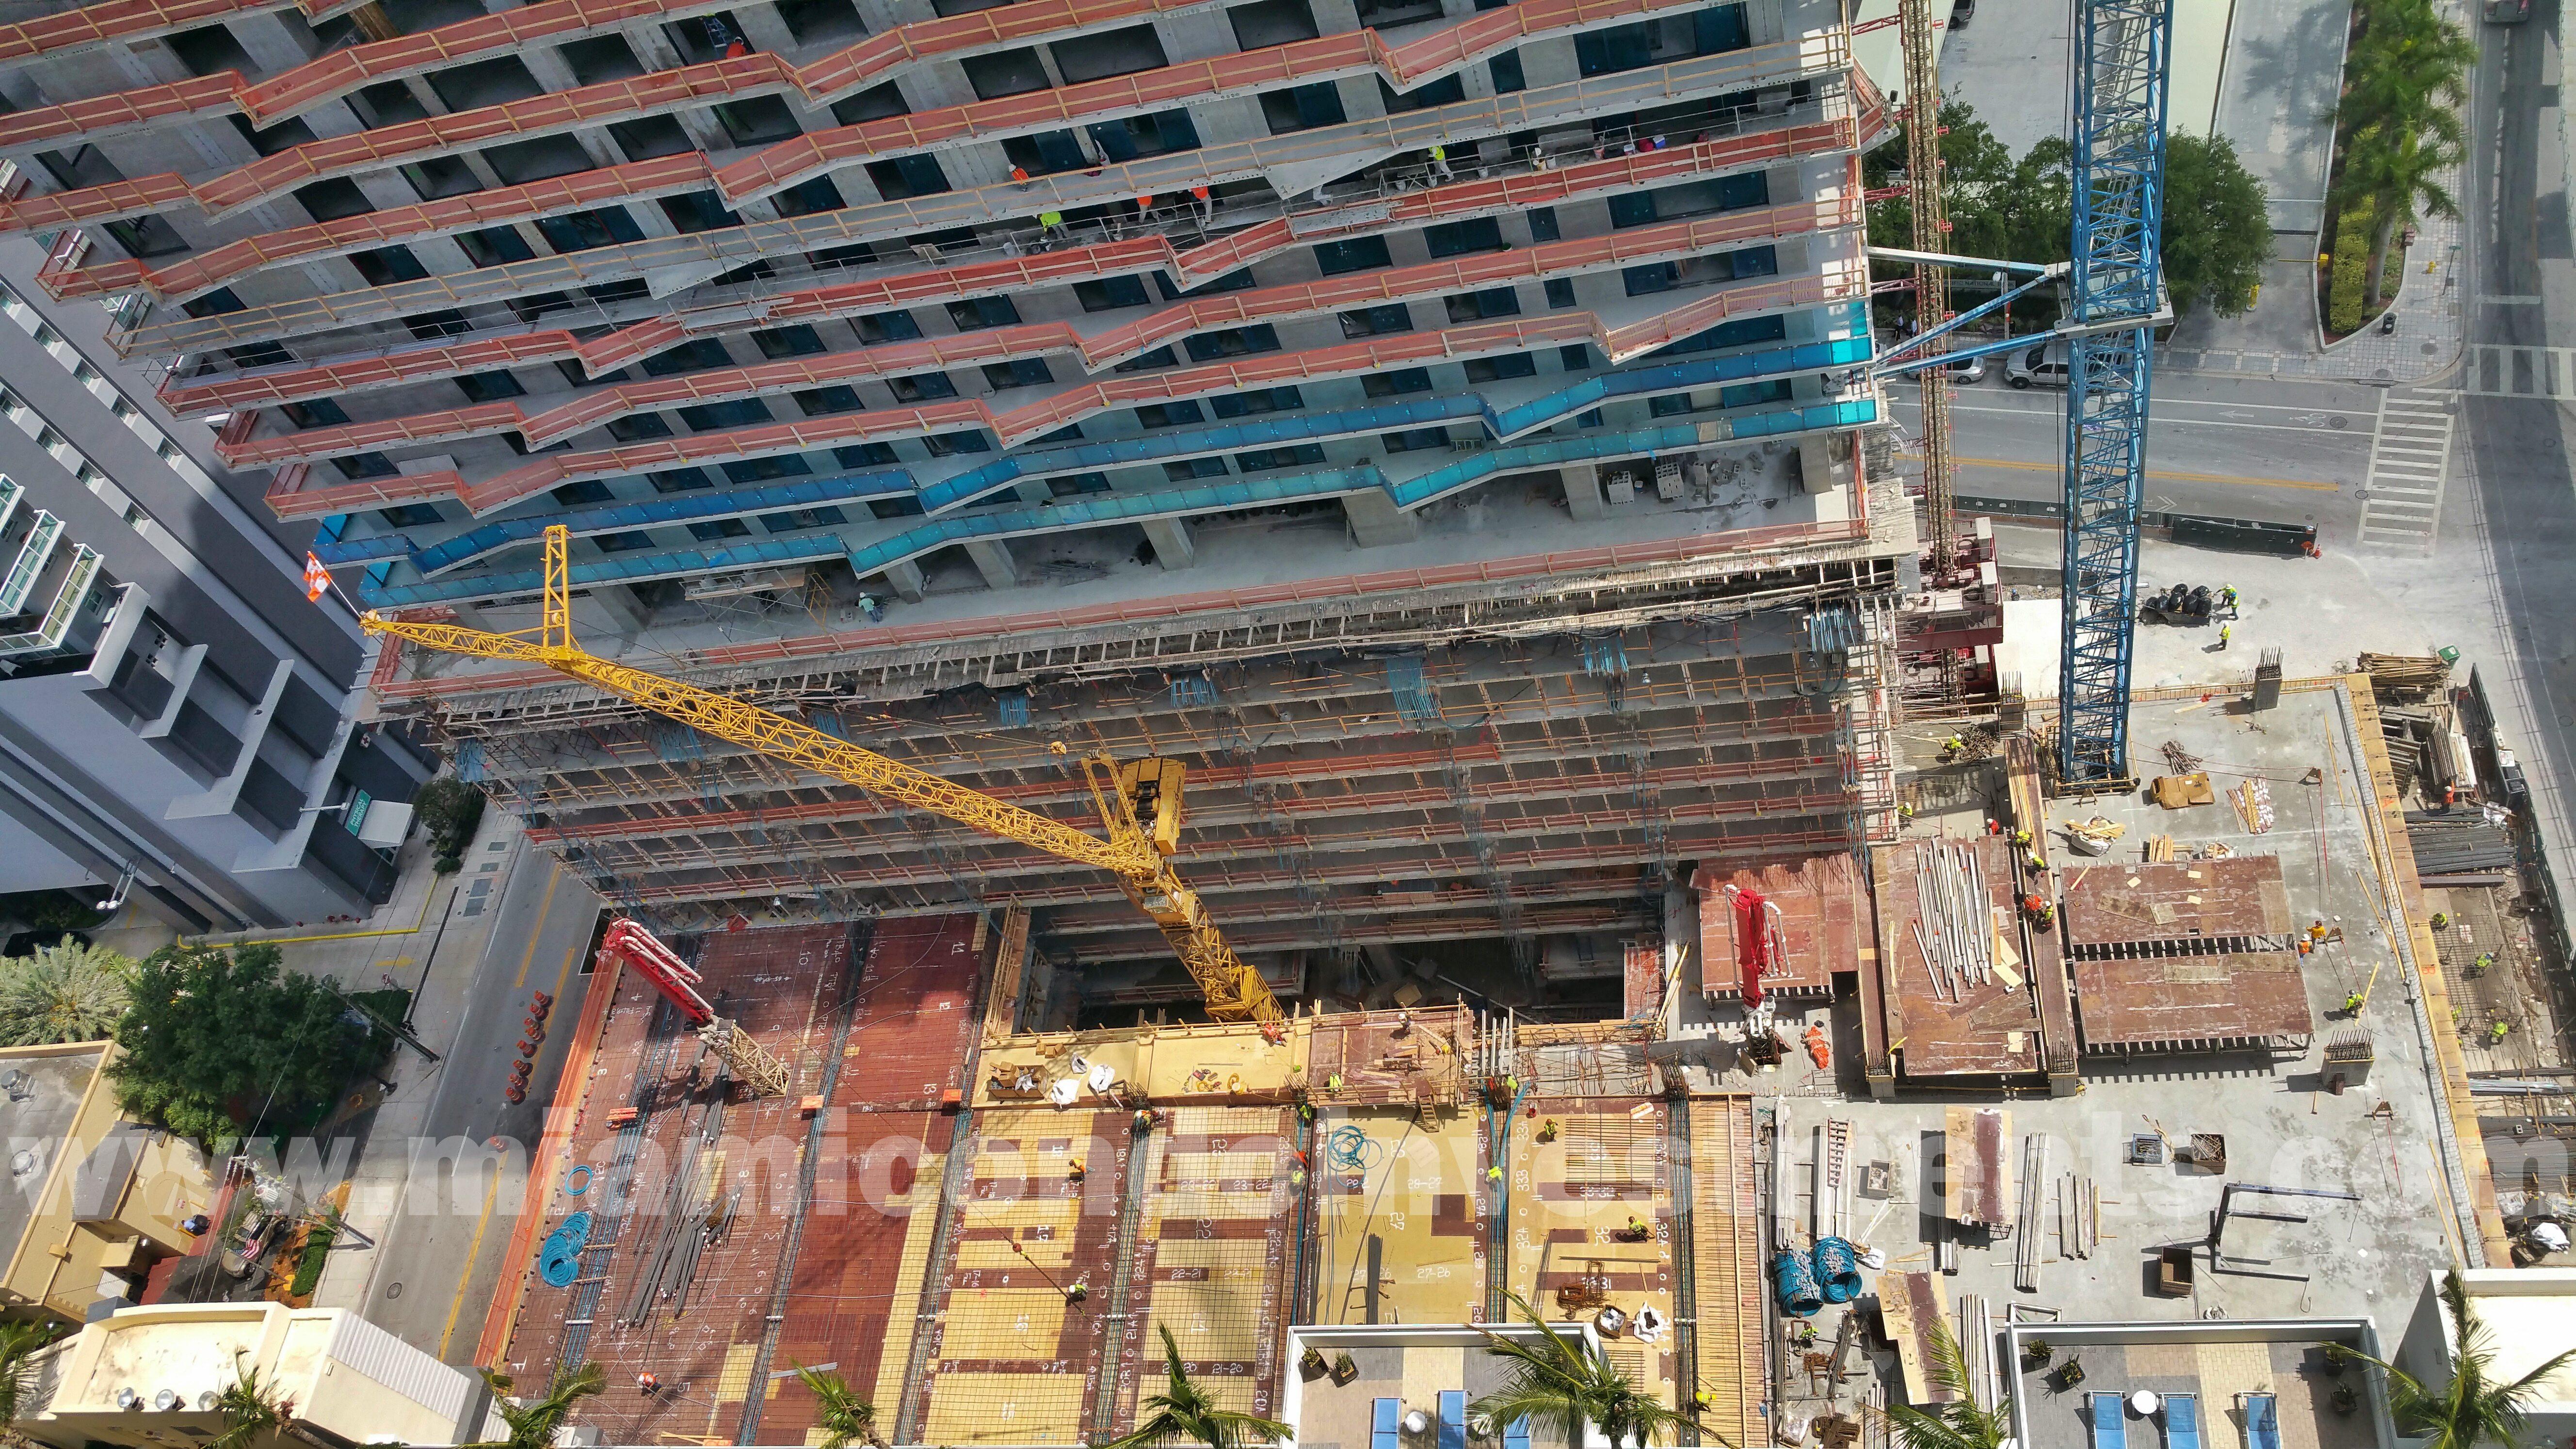 SLS Hotel & Residences pool deck